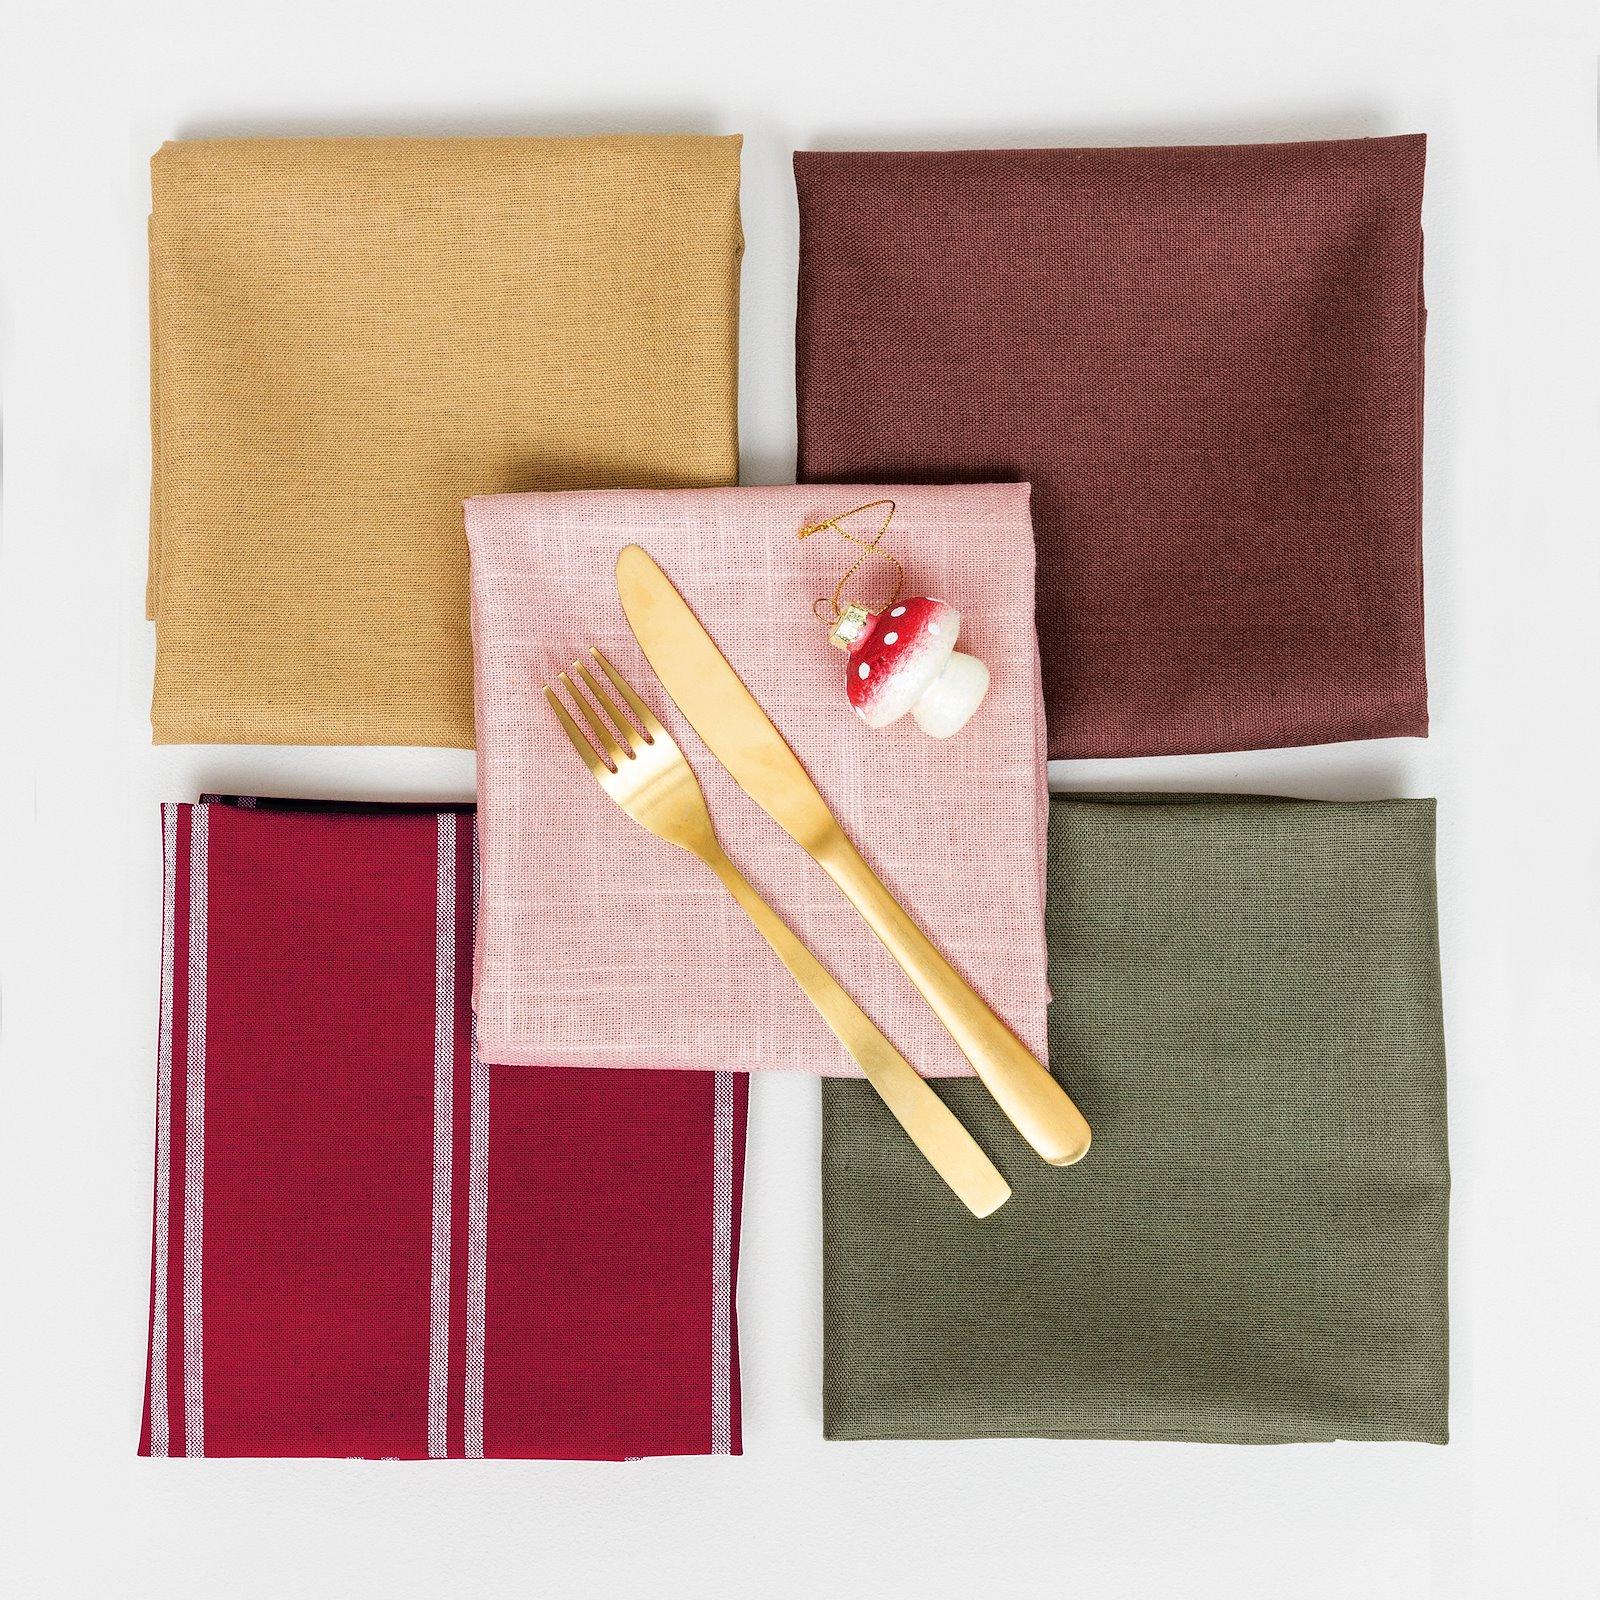 Linen/cotton army green DIY8003_410144_816257_410146_410145_bundle